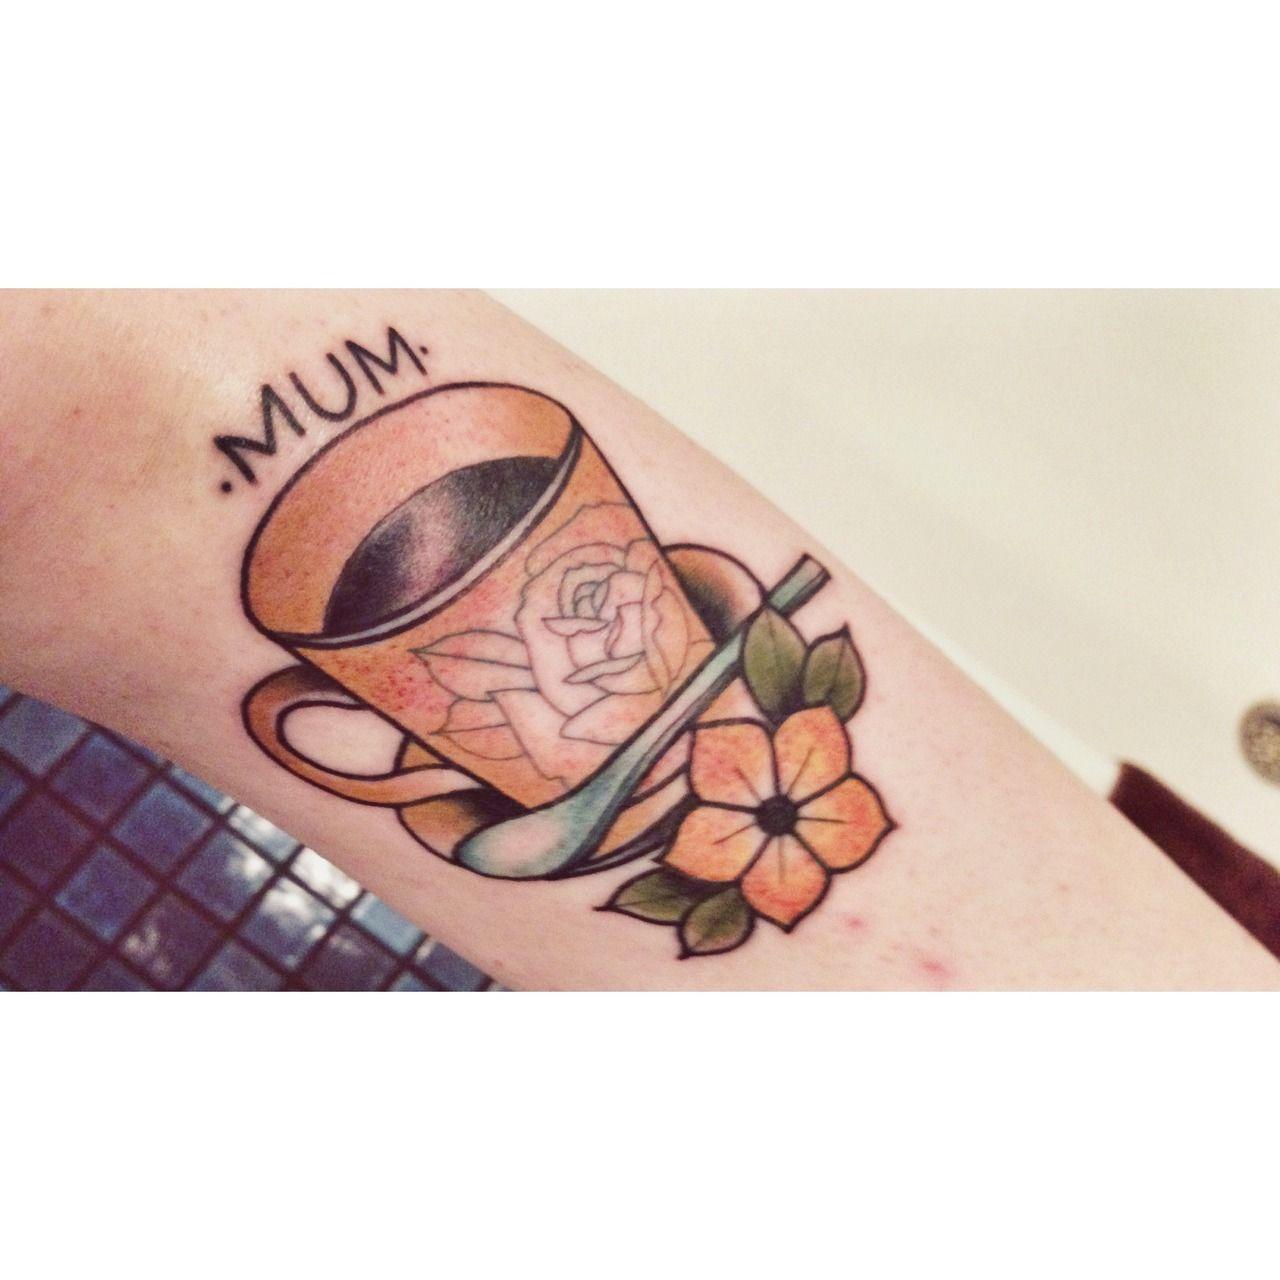 Done By Jon At Wild At Heart Tattoo Brisbane Qld Wild Heart Tattoo Tattoos Teacup Tattoo